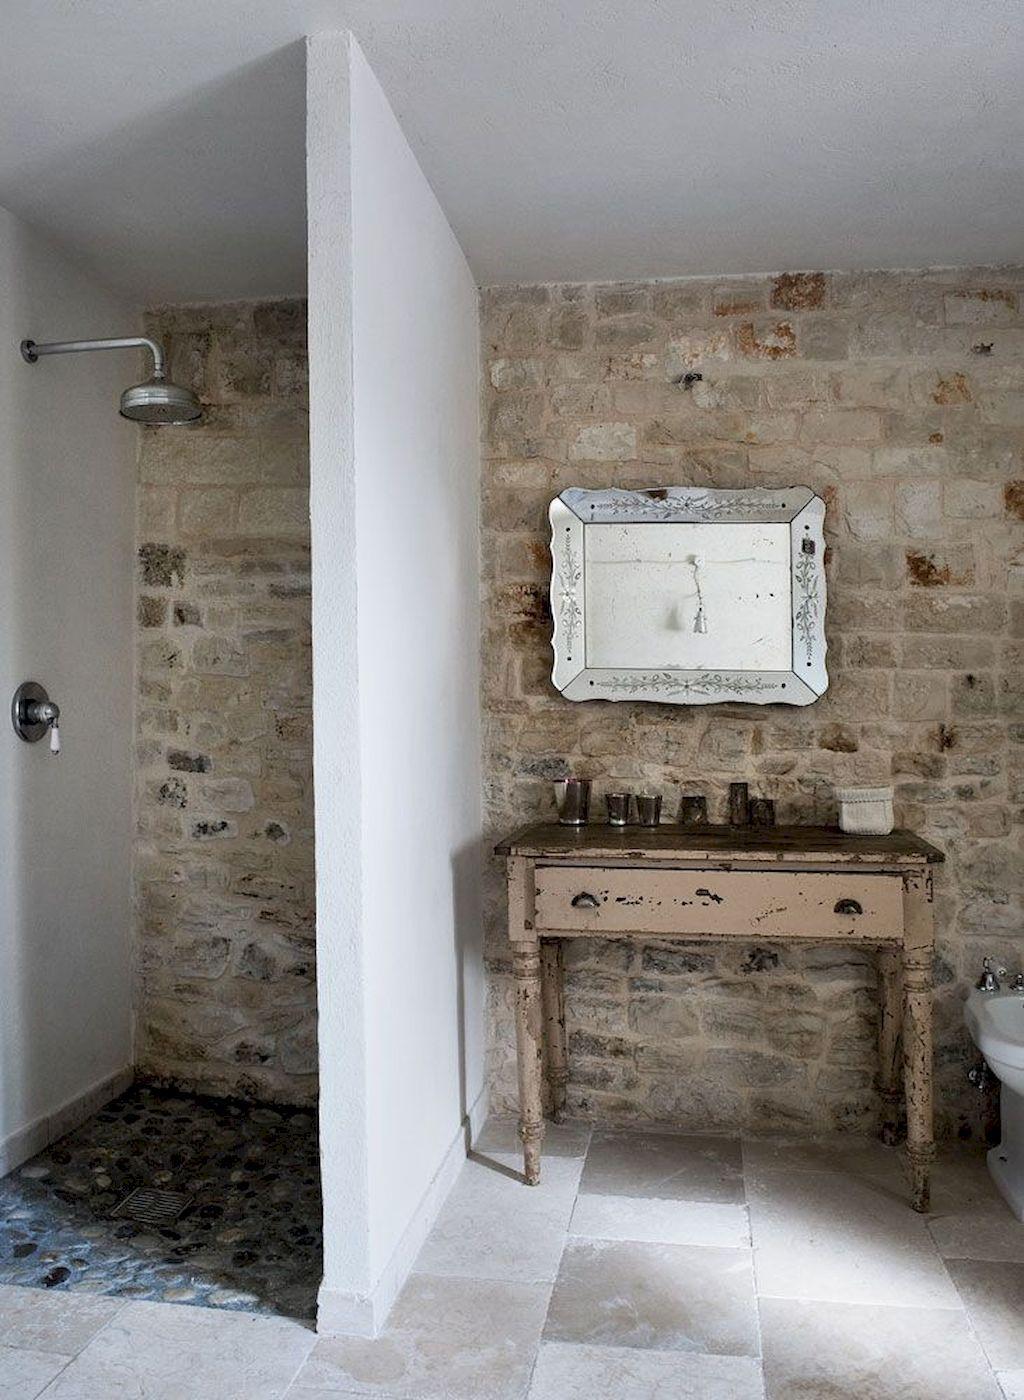 Adorable 150 Awesome Farmhouse Bathroom Tile Floor Decor Ideas And Remodel To Inspire Your Bathroom Https Coachde Italian Bathroom Shower Doors Tile Bathroom